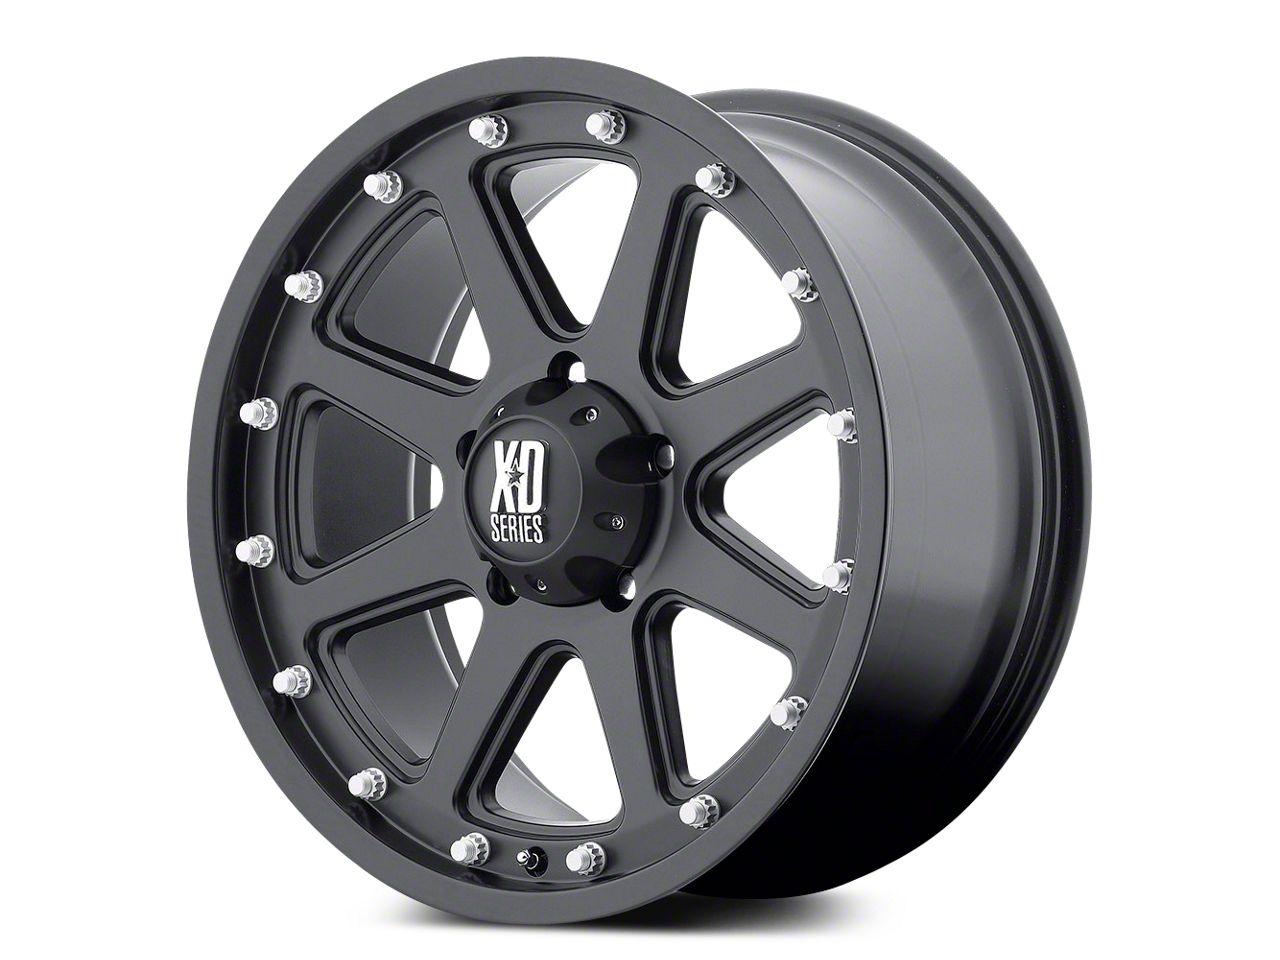 XD Addict Matte Black 5-Lug Wheel - 18x9 (02-18 RAM 1500, Excluding Mega Cab)